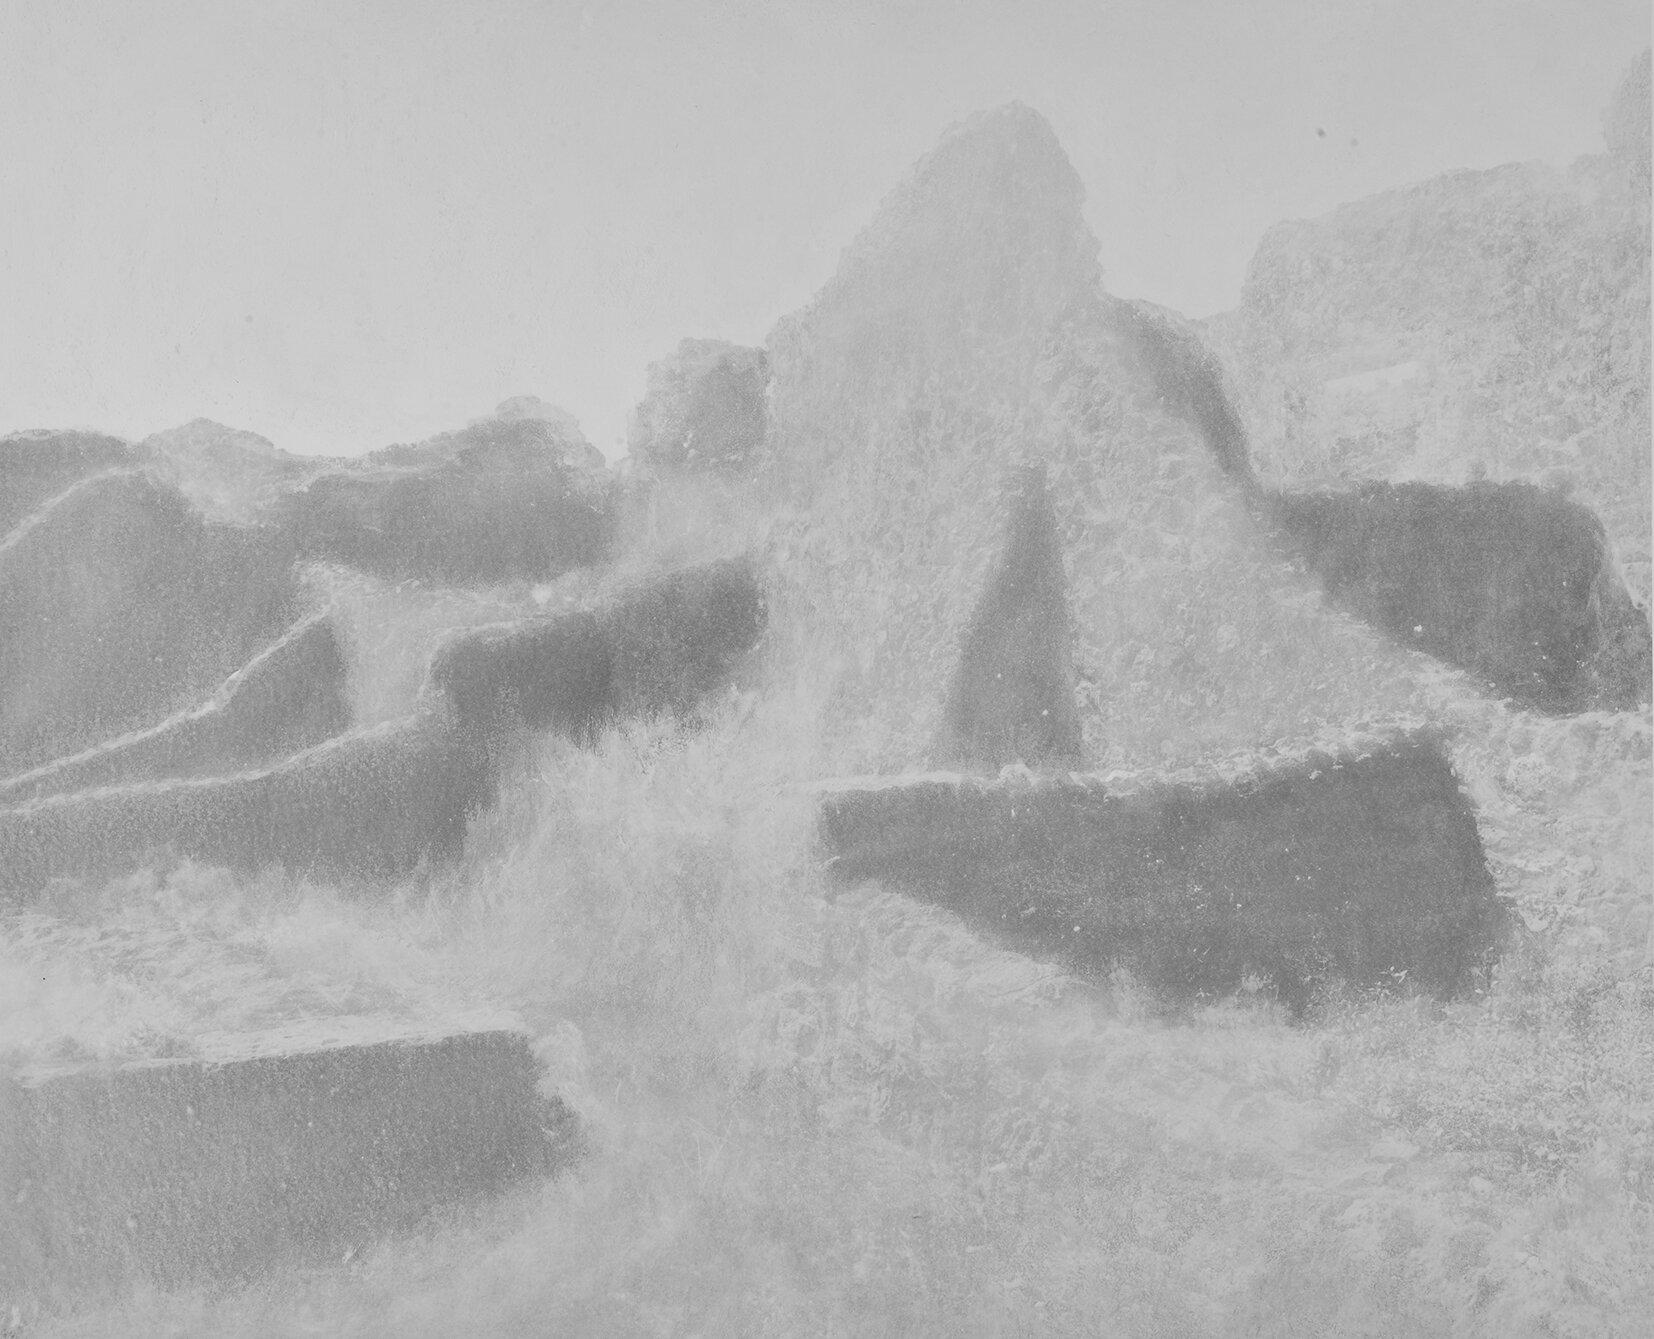 Pompeii_walls_courtesyGalerieThierrBigaignon.jpg